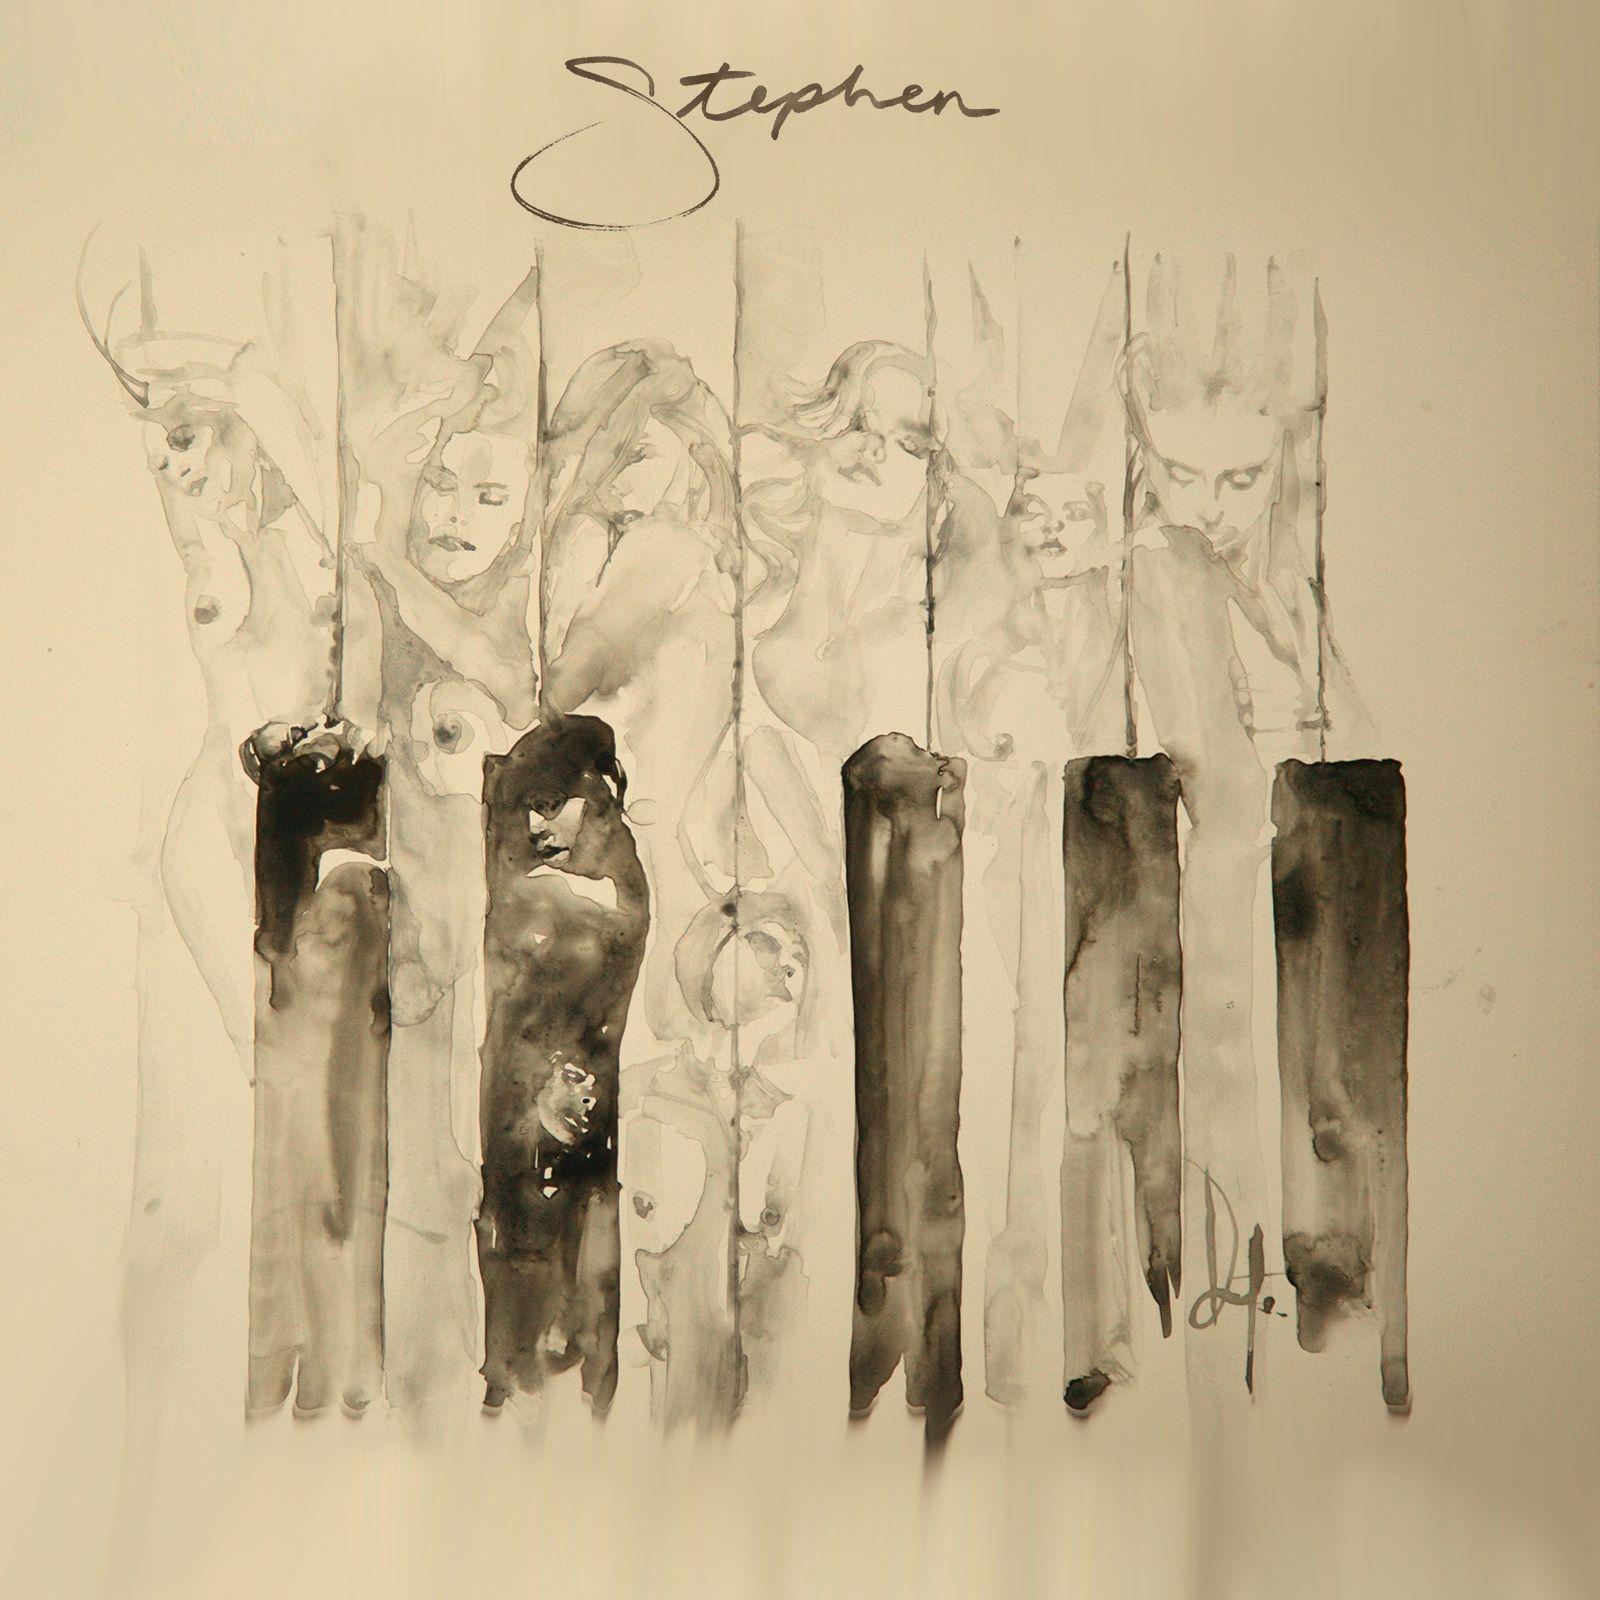 Stephen-Fly-Down.jpg